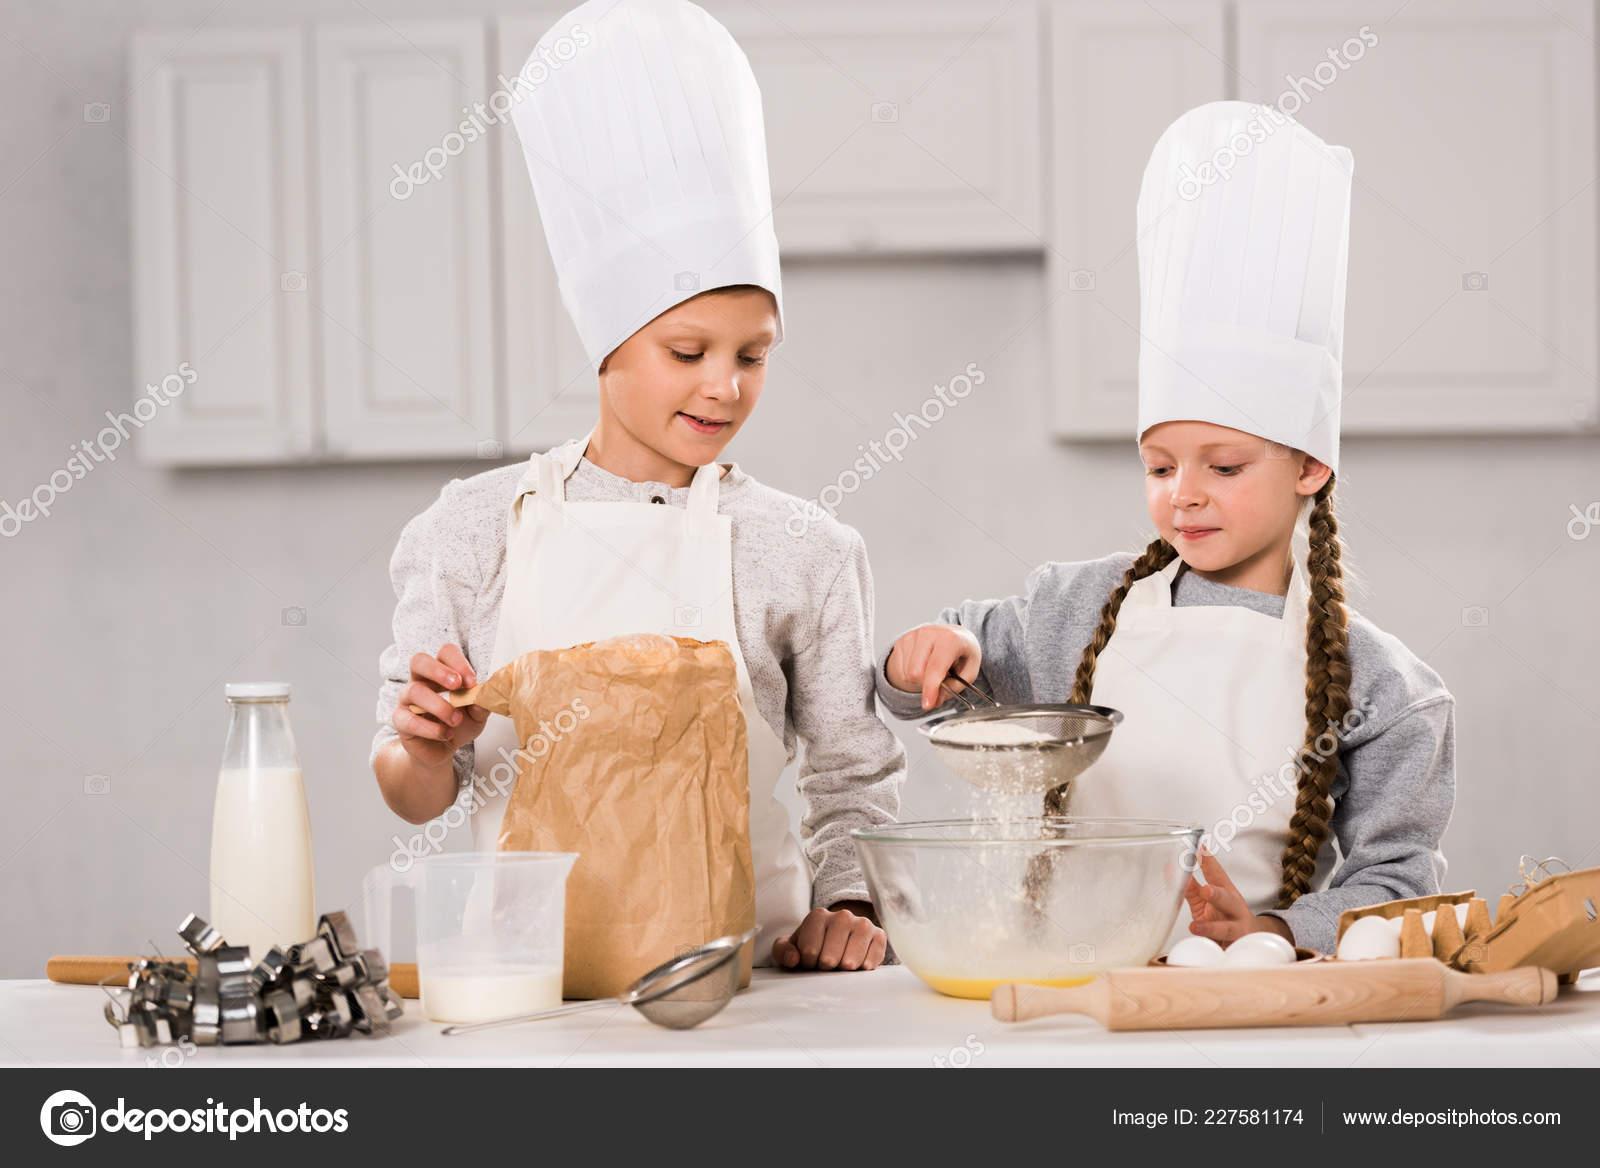 kitchen apron for kids chair cushions with ties 快乐的孩子在围裙筛选面粉通过筛子到碗在桌子在厨房 图库照片